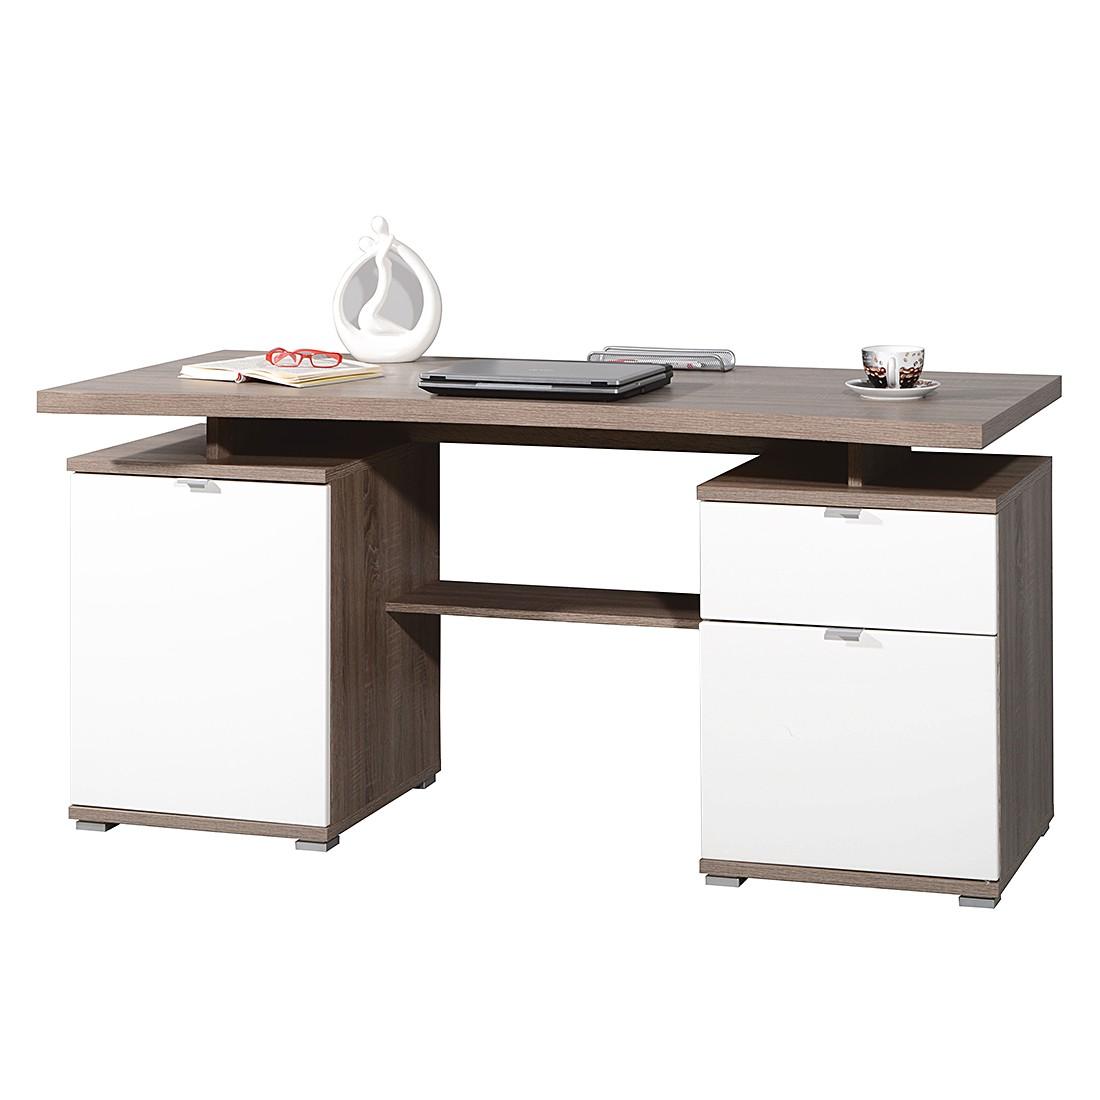 regal madina iii hochglanz wei home24office g nstig kaufen. Black Bedroom Furniture Sets. Home Design Ideas